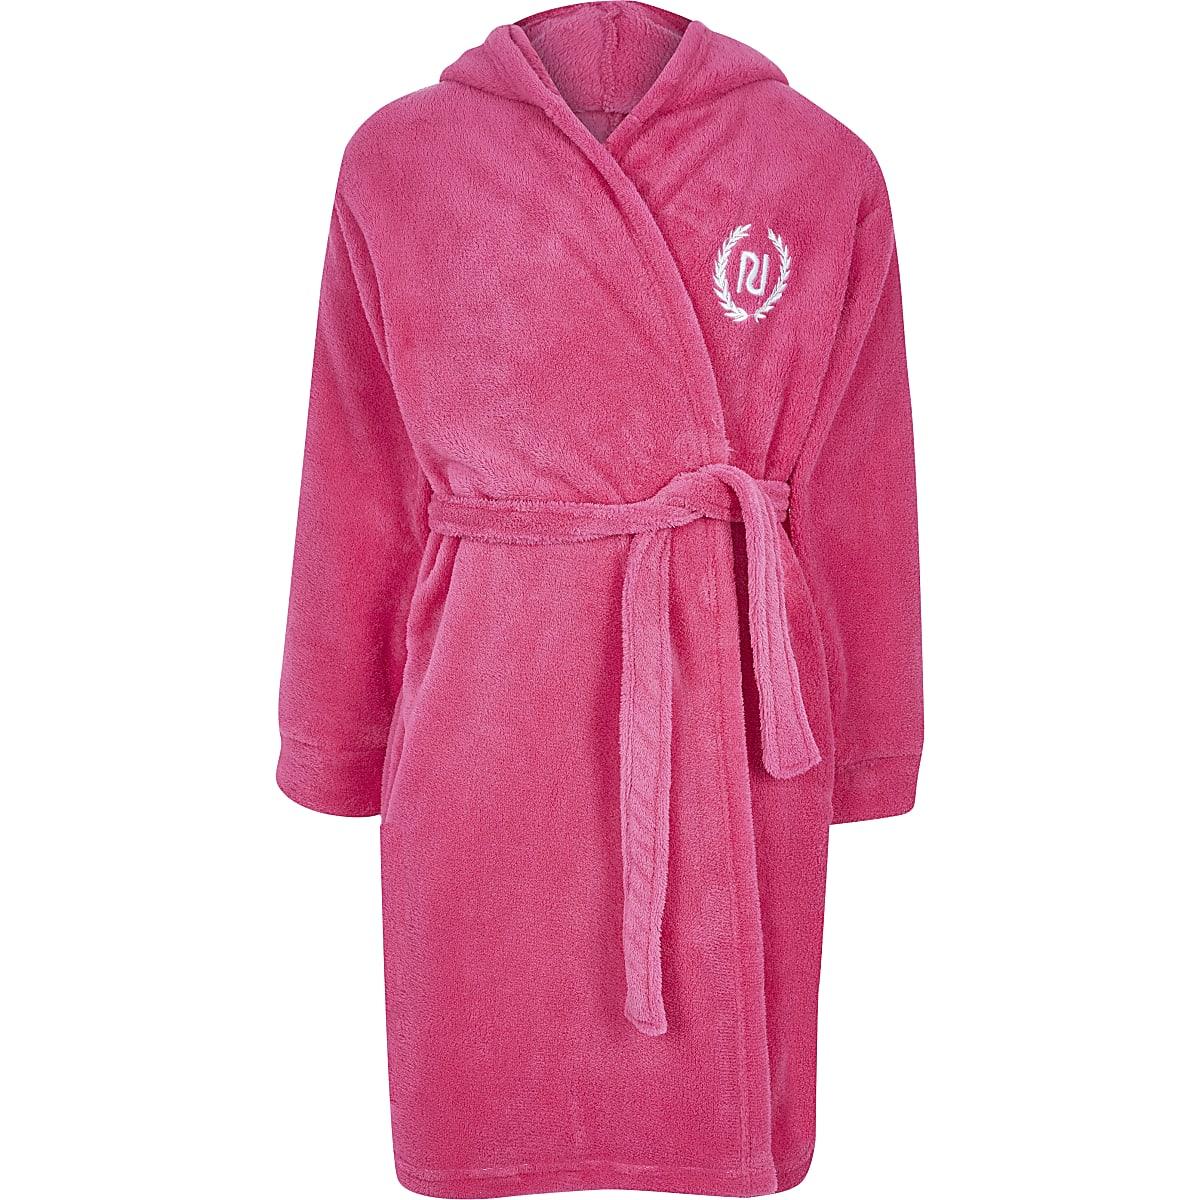 Girls pink Love RI robe fluffy dressing gown